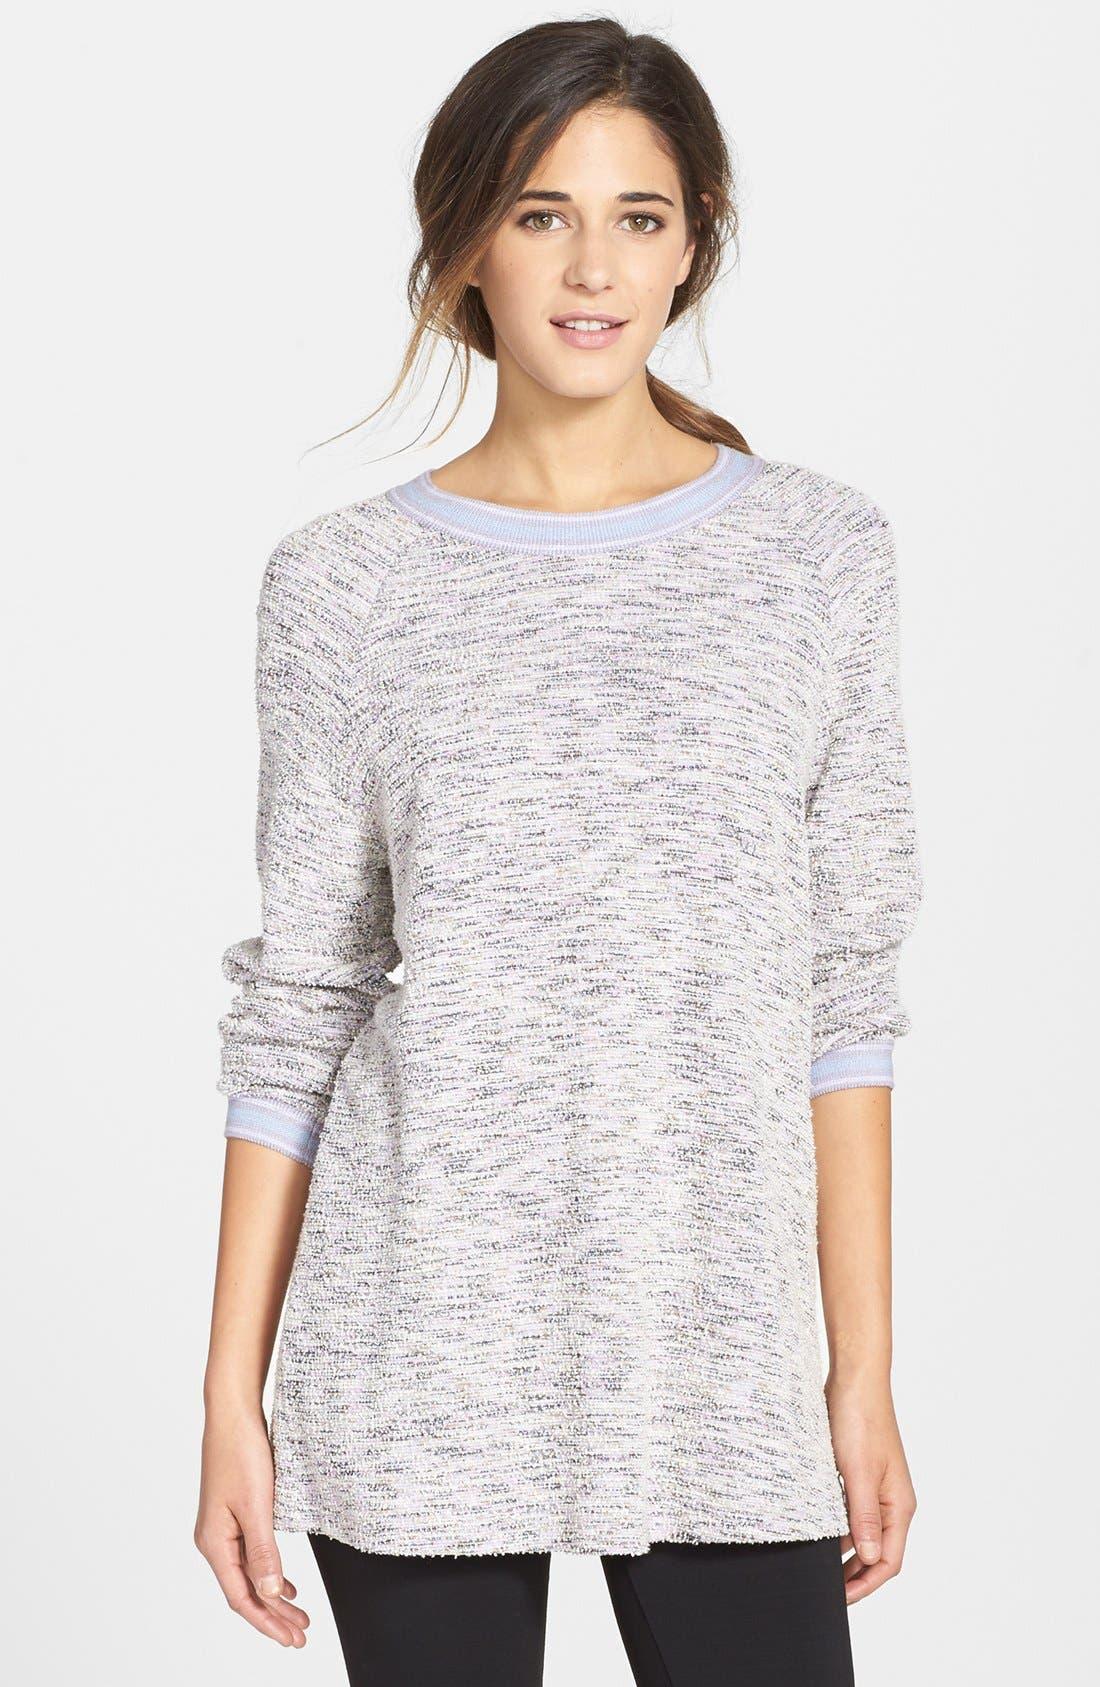 Main Image - Only Hearts Oversize Bouclé Knit Sweatshirt